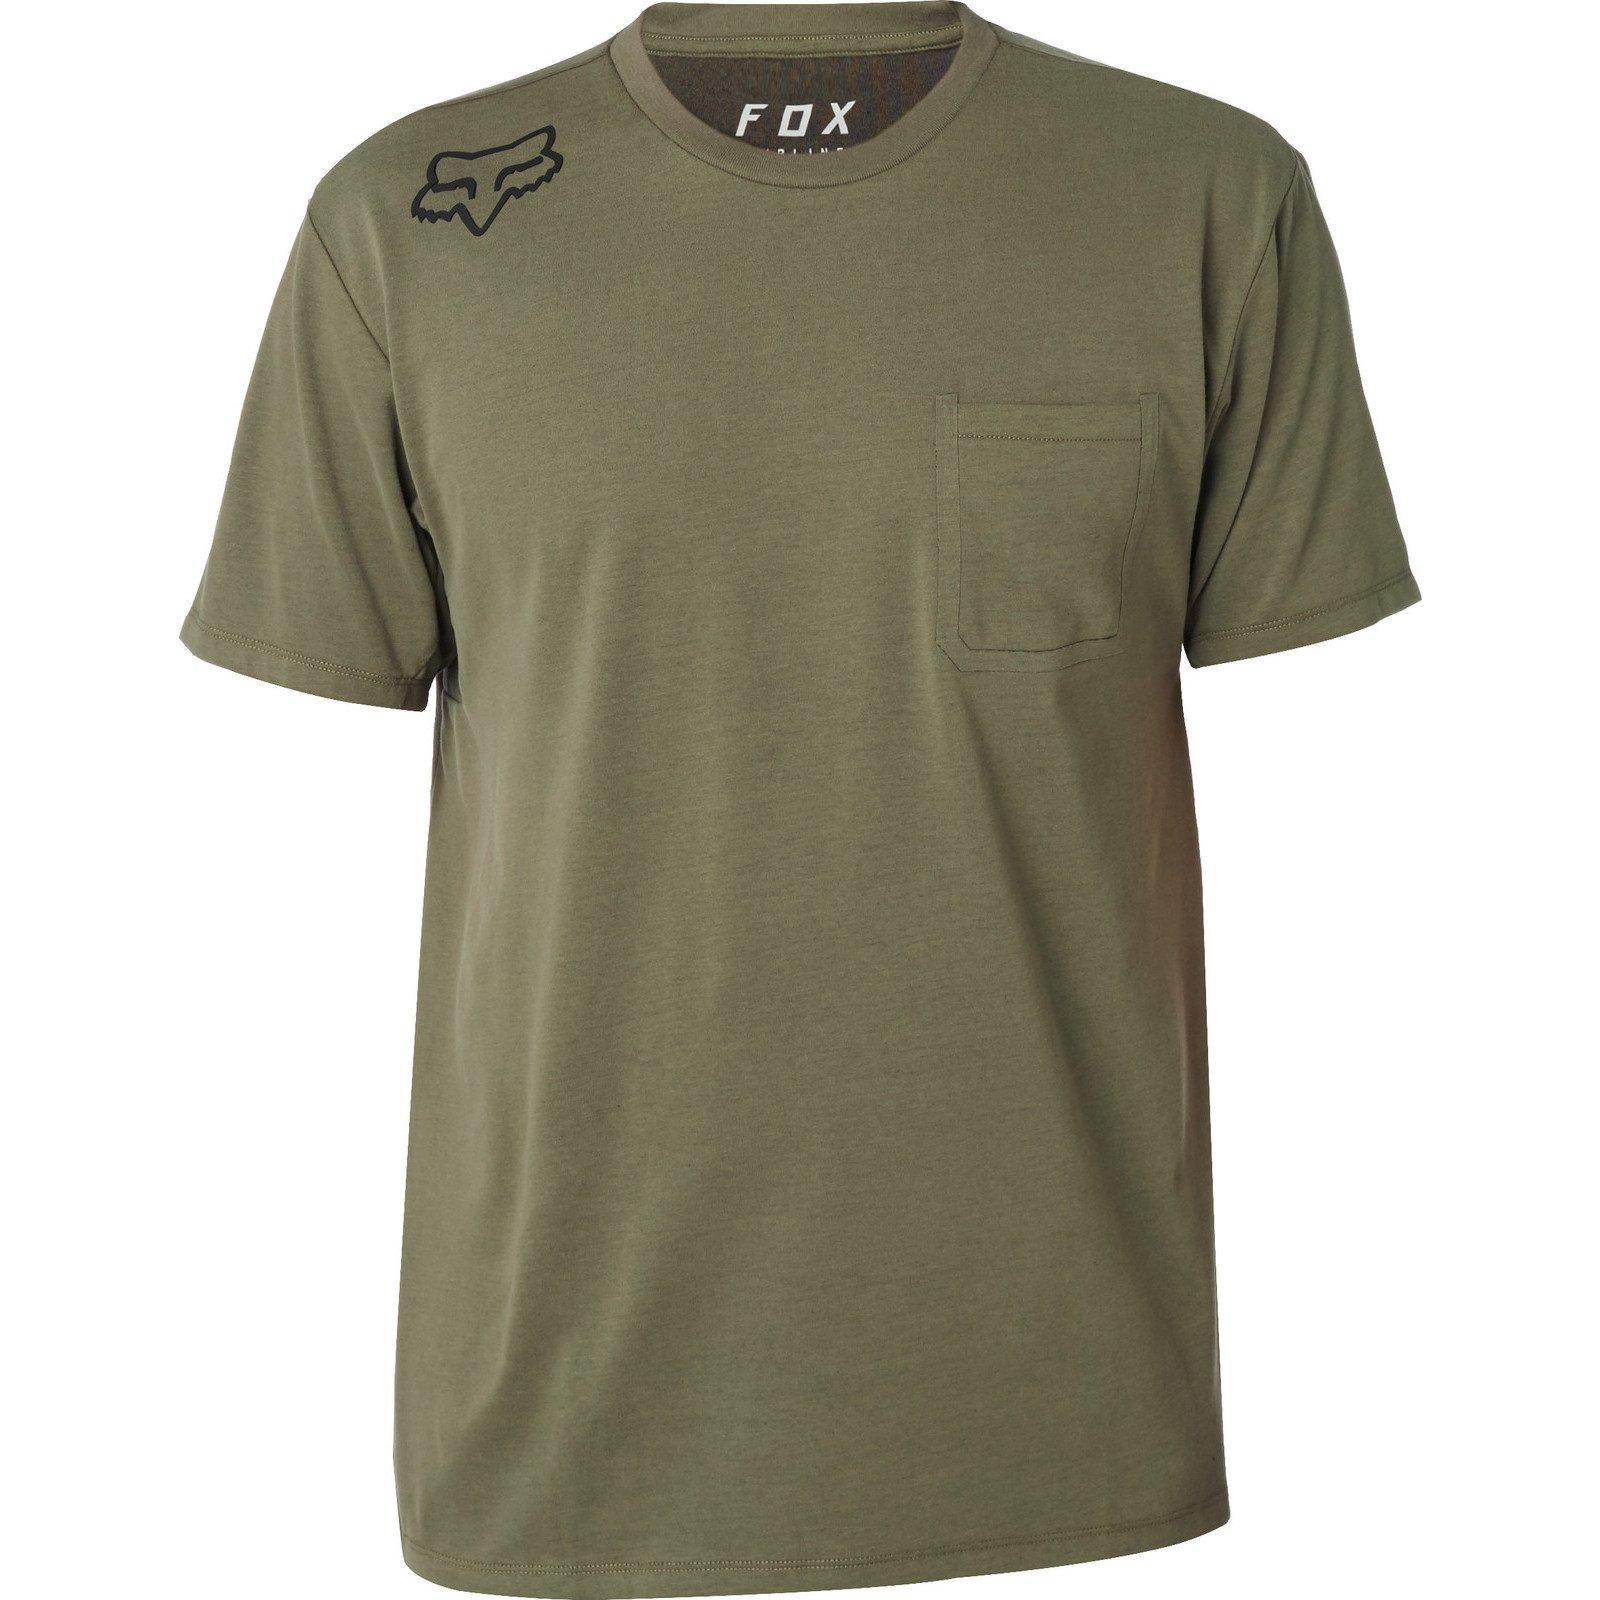 Fox Redplate 360 Airline - Camiseta (Talla M), Color Verde: Amazon.es: Coche y moto